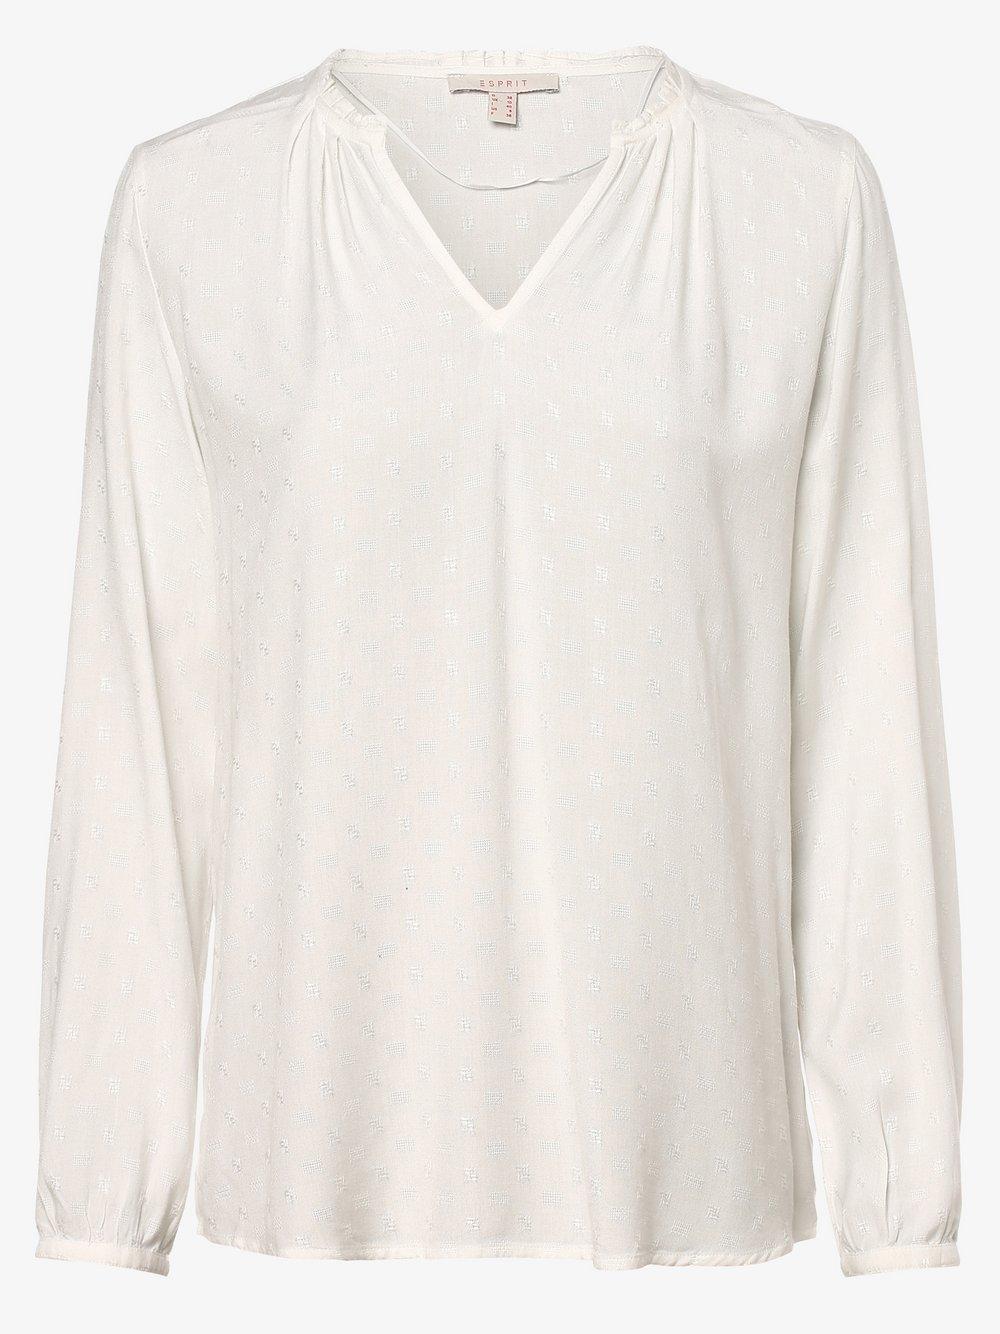 Esprit Casual – Bluzka damska, beżowy Van Graaf 457319-0001-00400